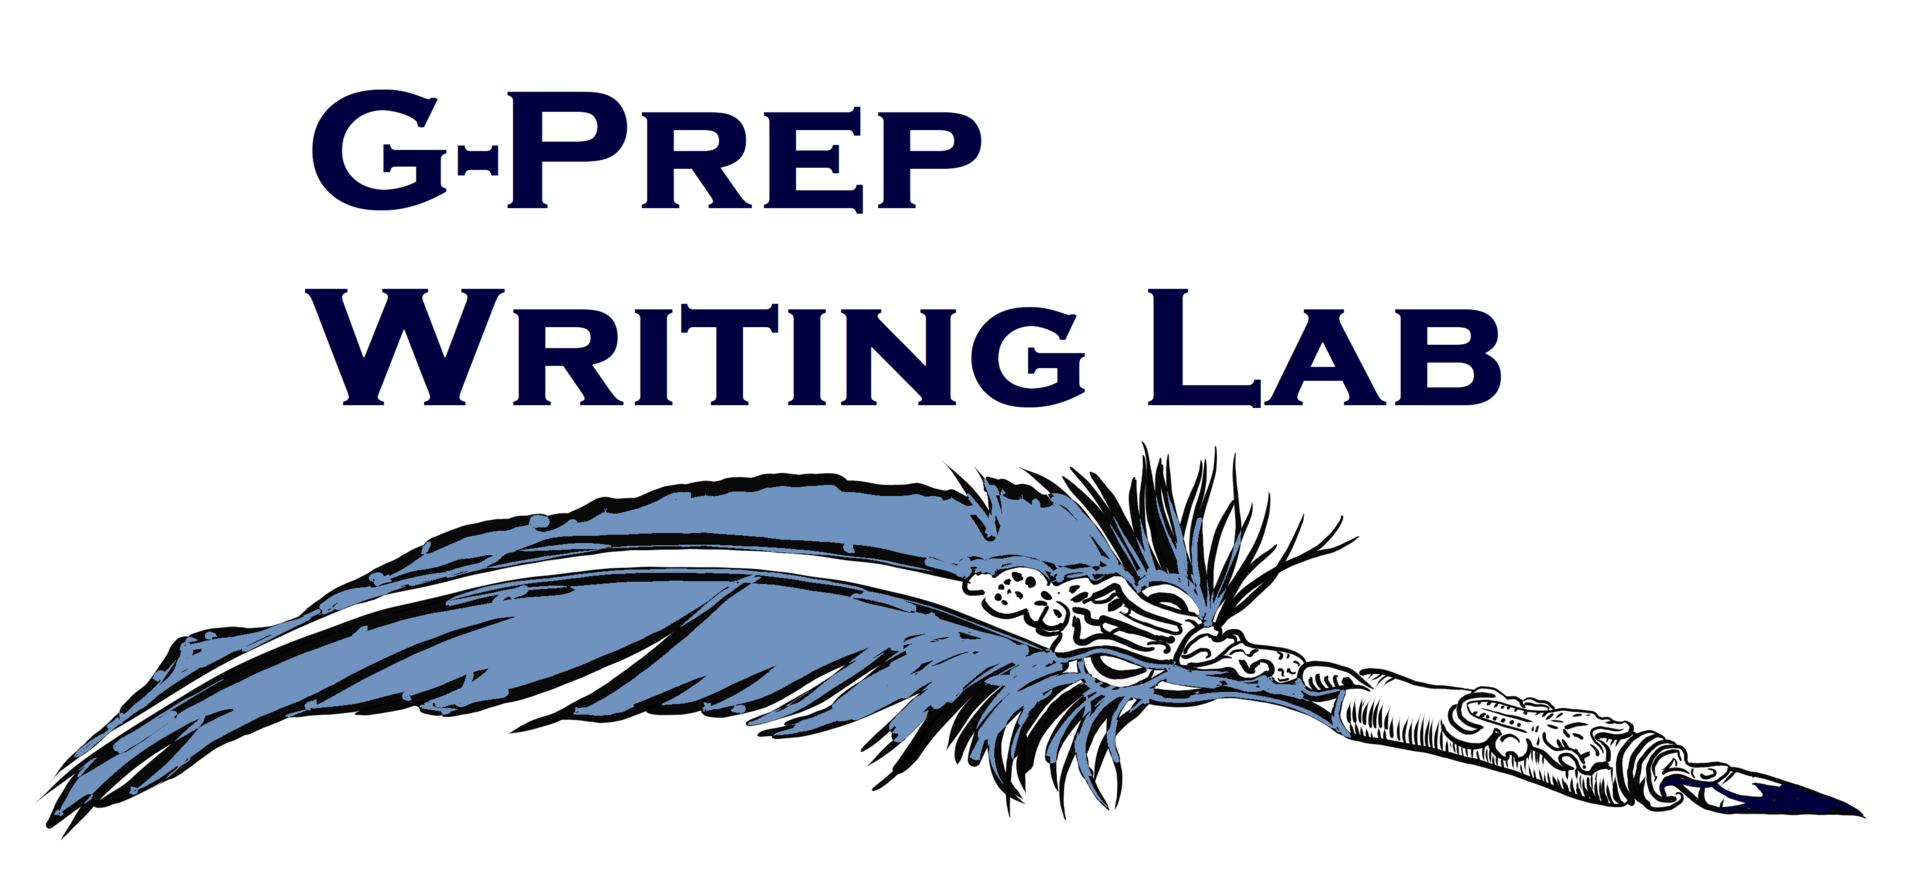 G-Prep Writing Lab